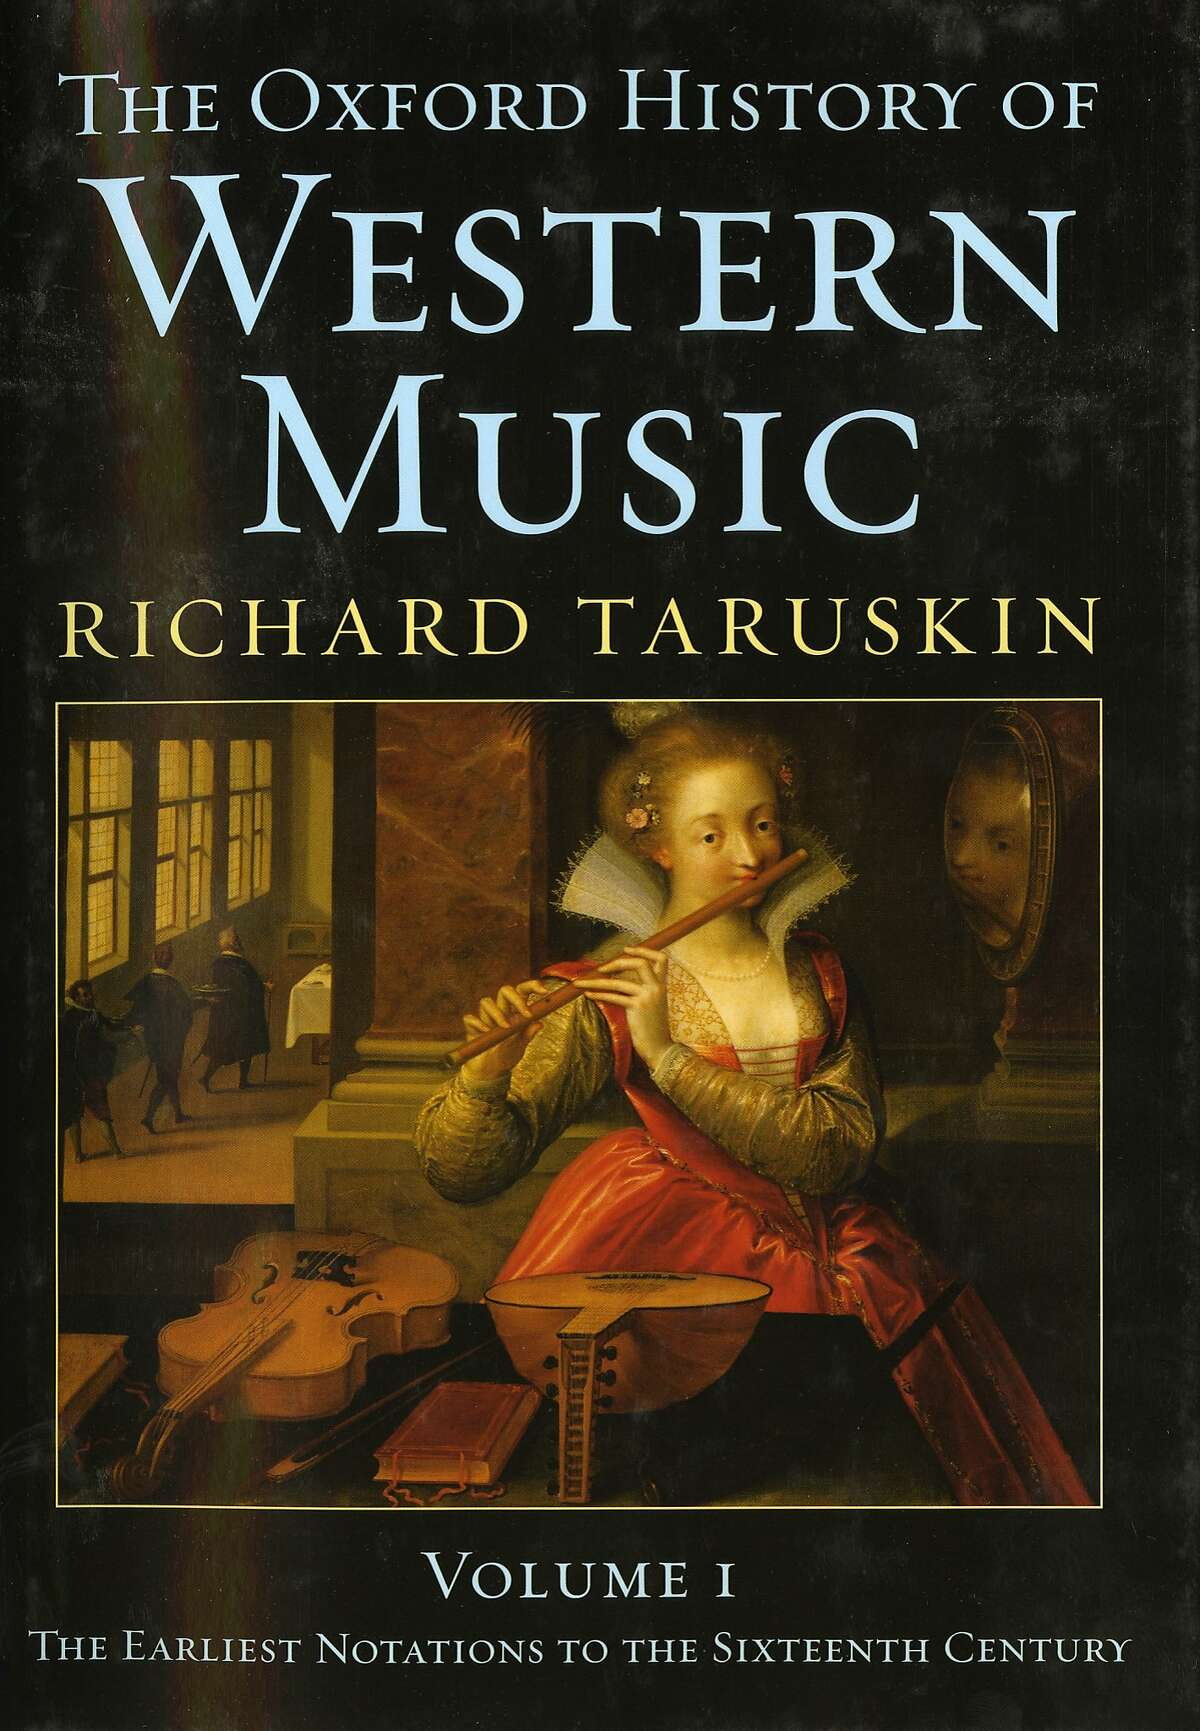 History of Western Music By Richard Taruskin Ran on: 04-03-2005 Ran on: 04-10-2005